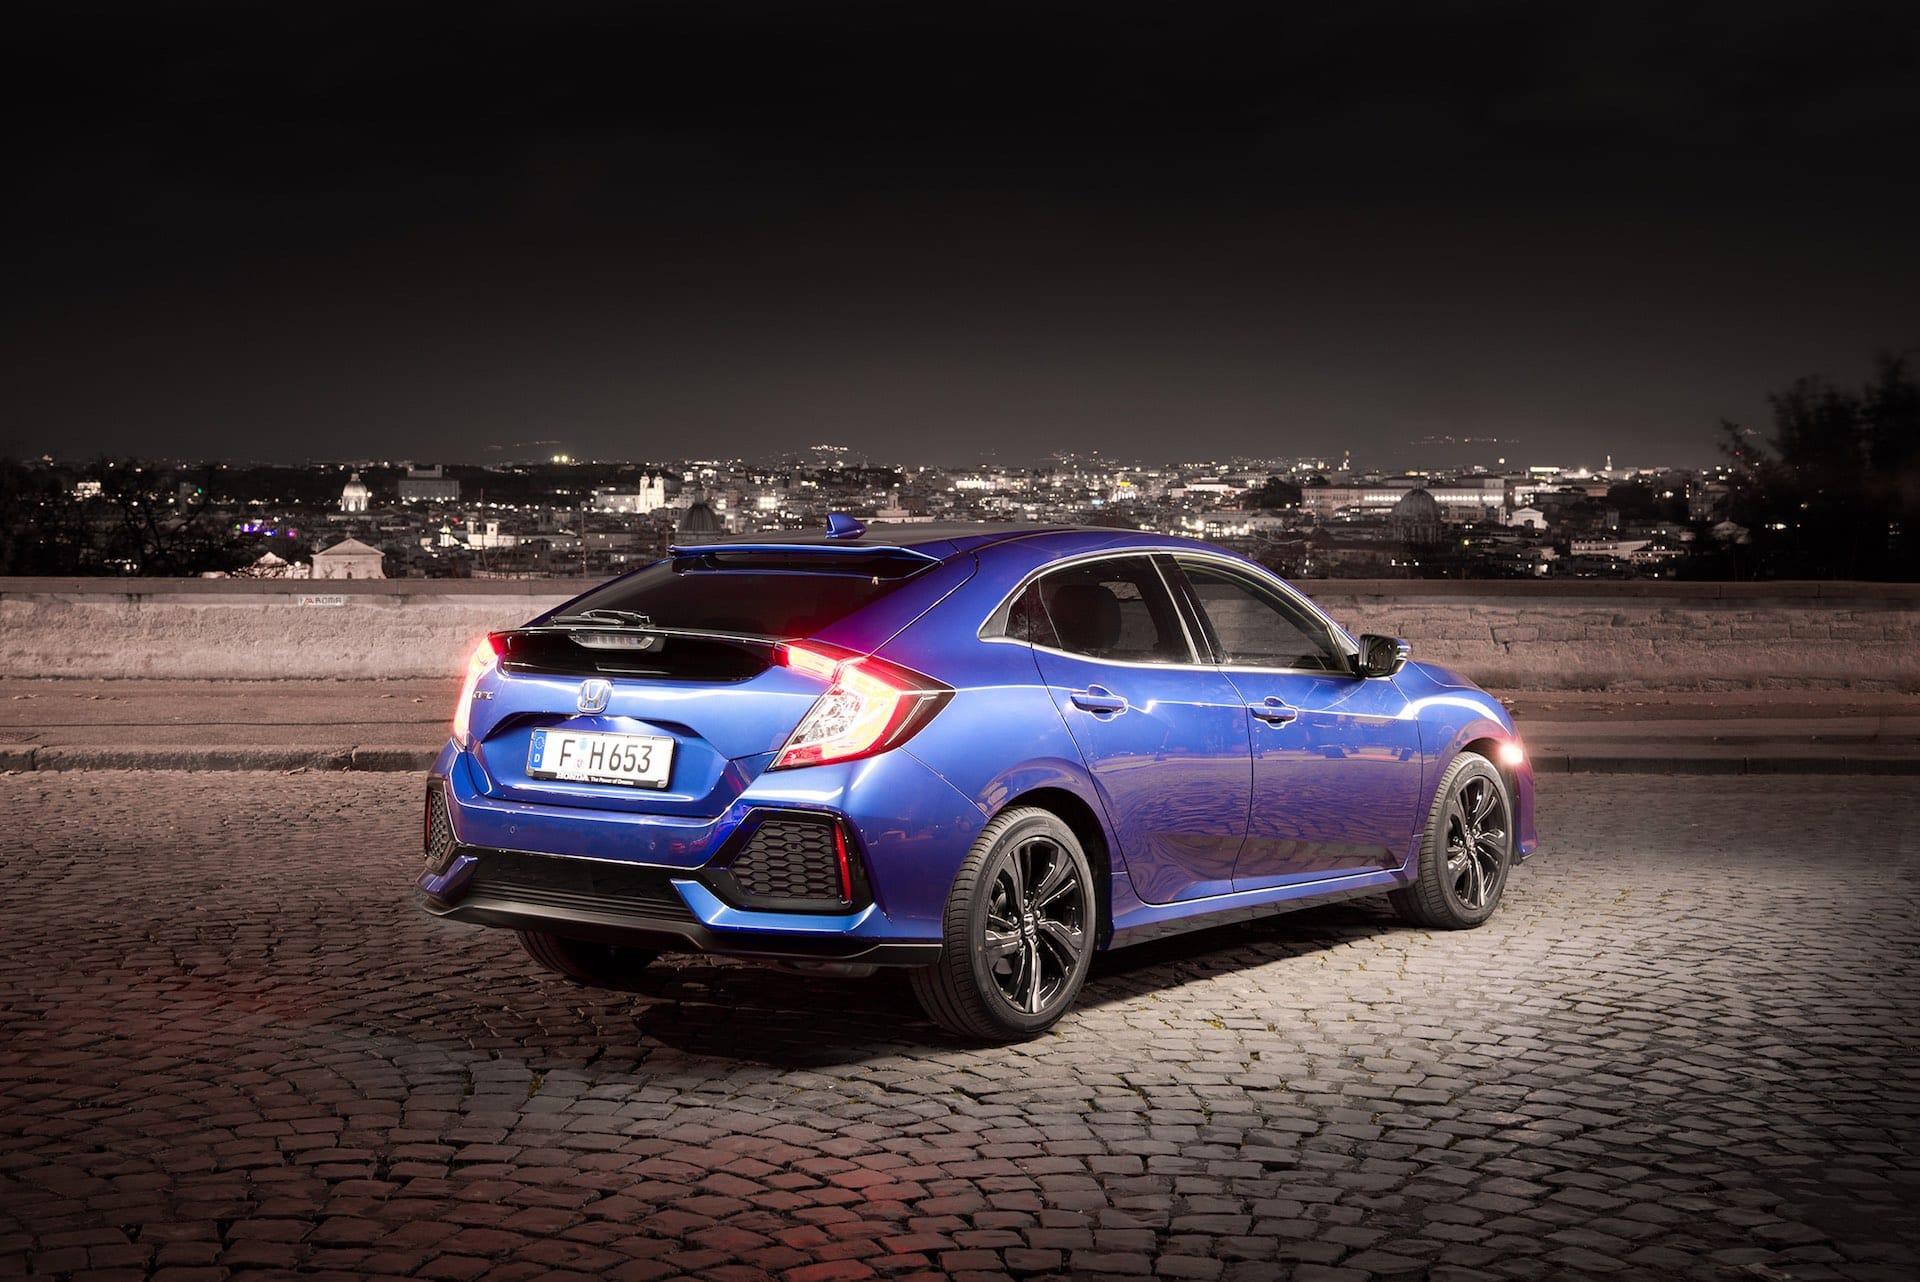 Honda Civic overlooking Rome at night